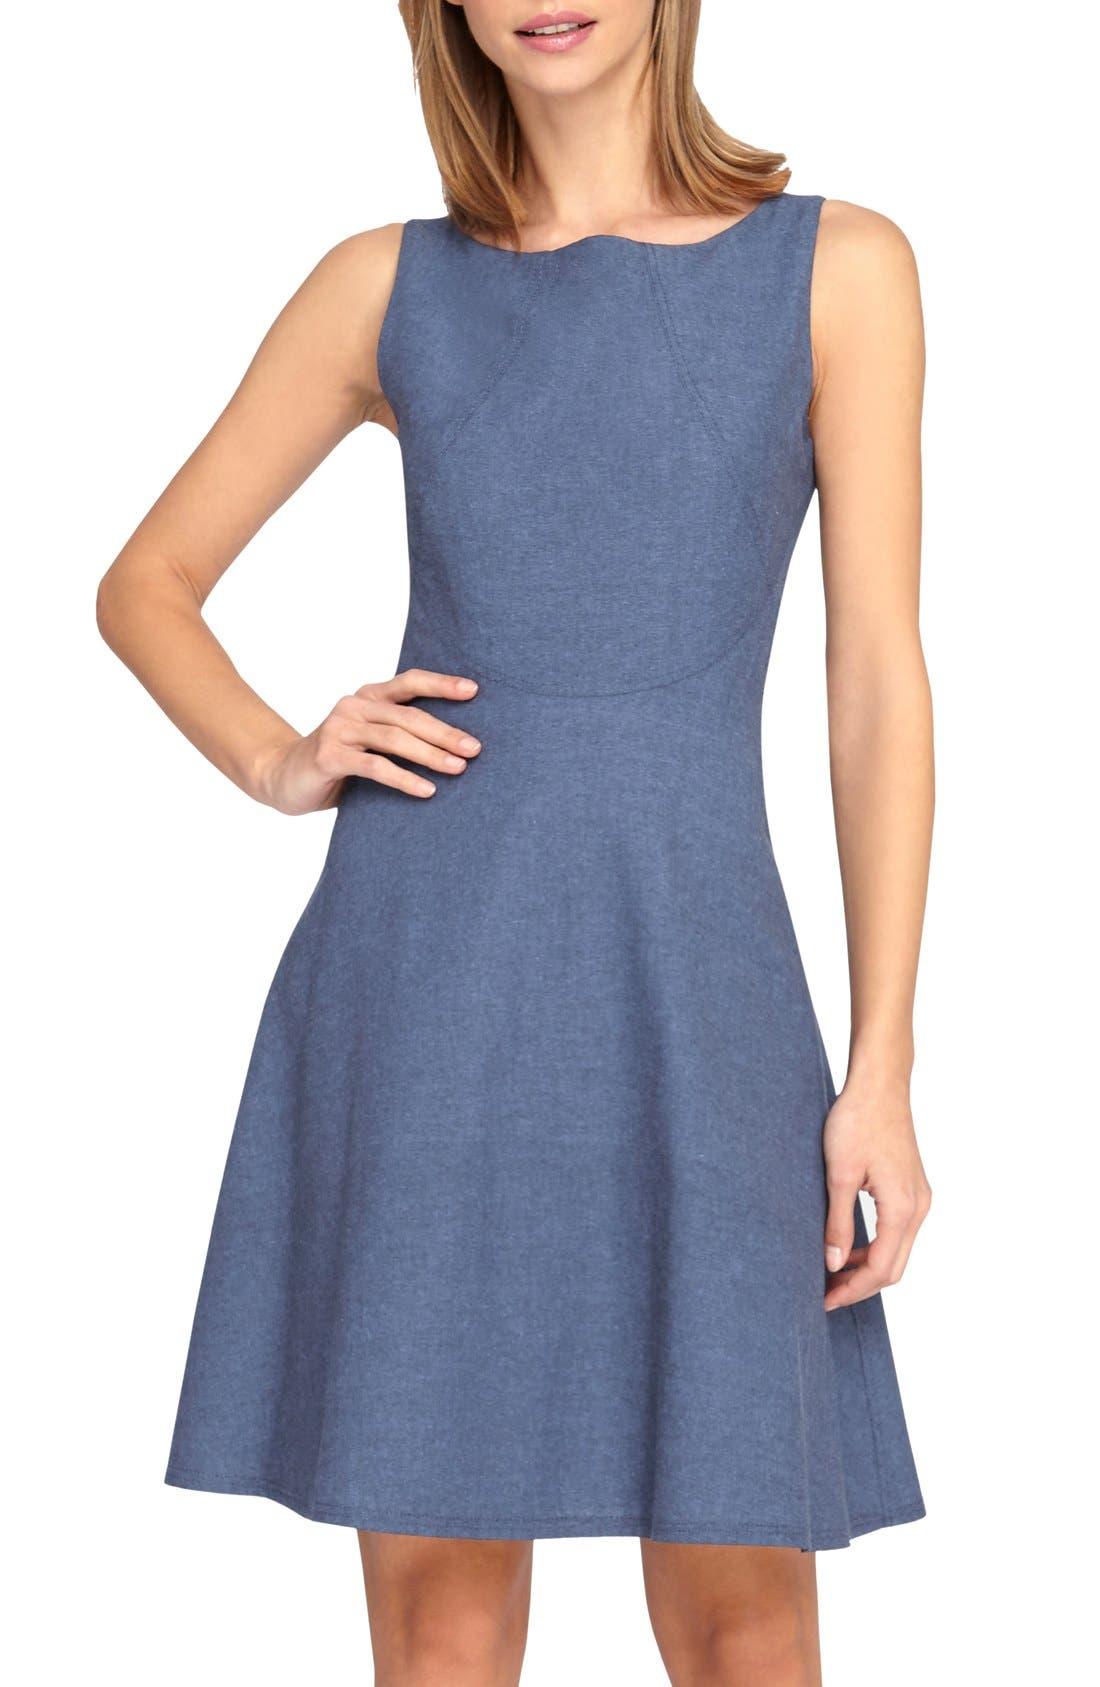 Main Image - Tahari Chambray Fit & Flare Dress